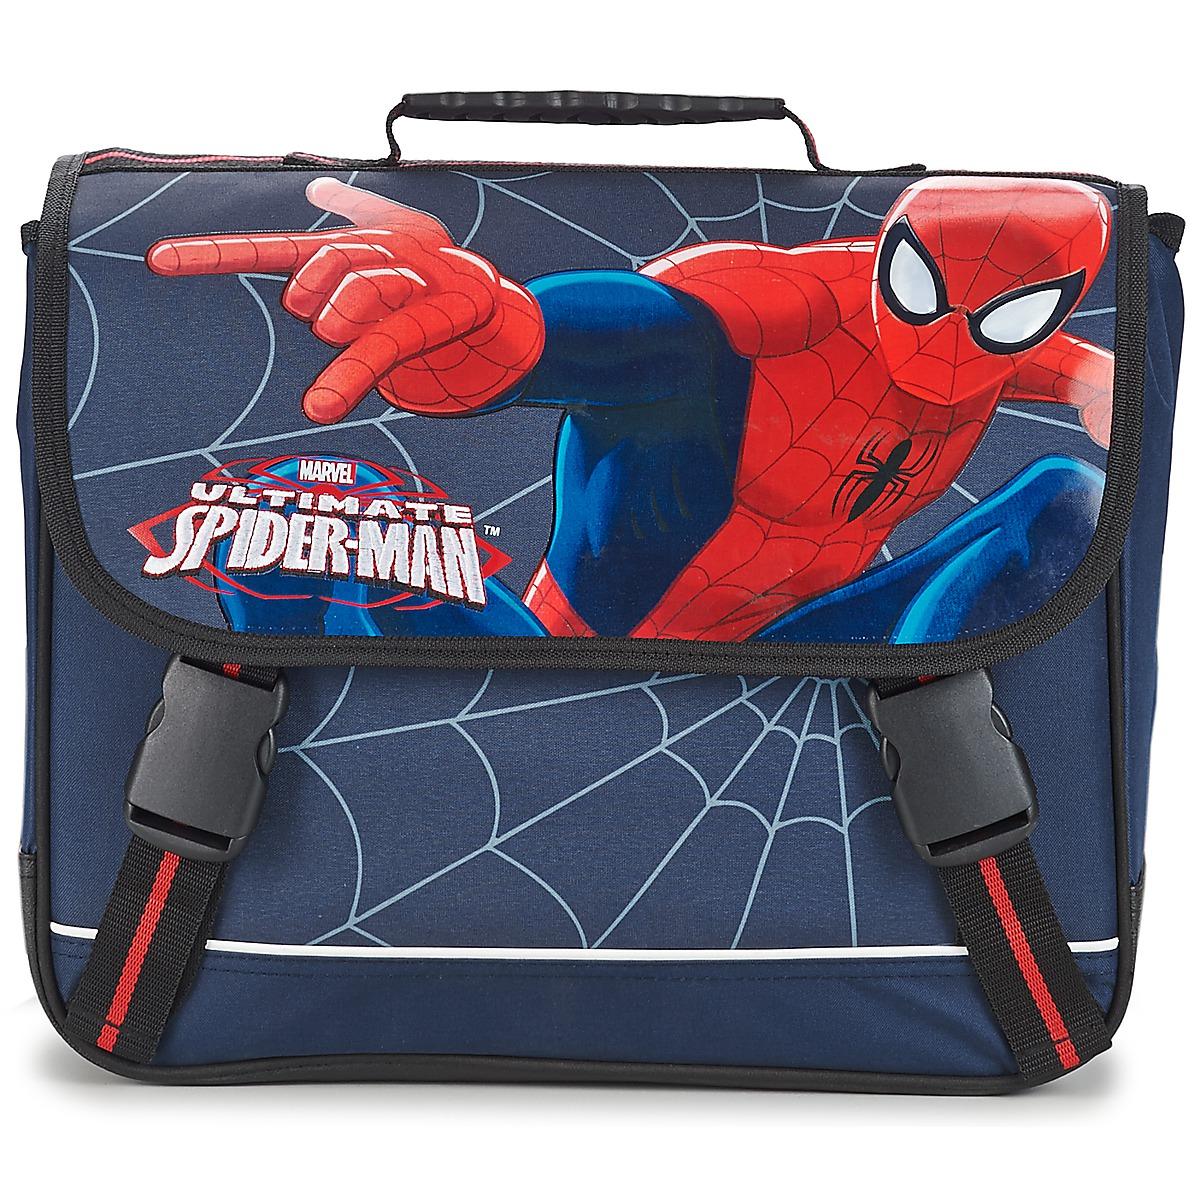 Cartable Spiderman zM0bm